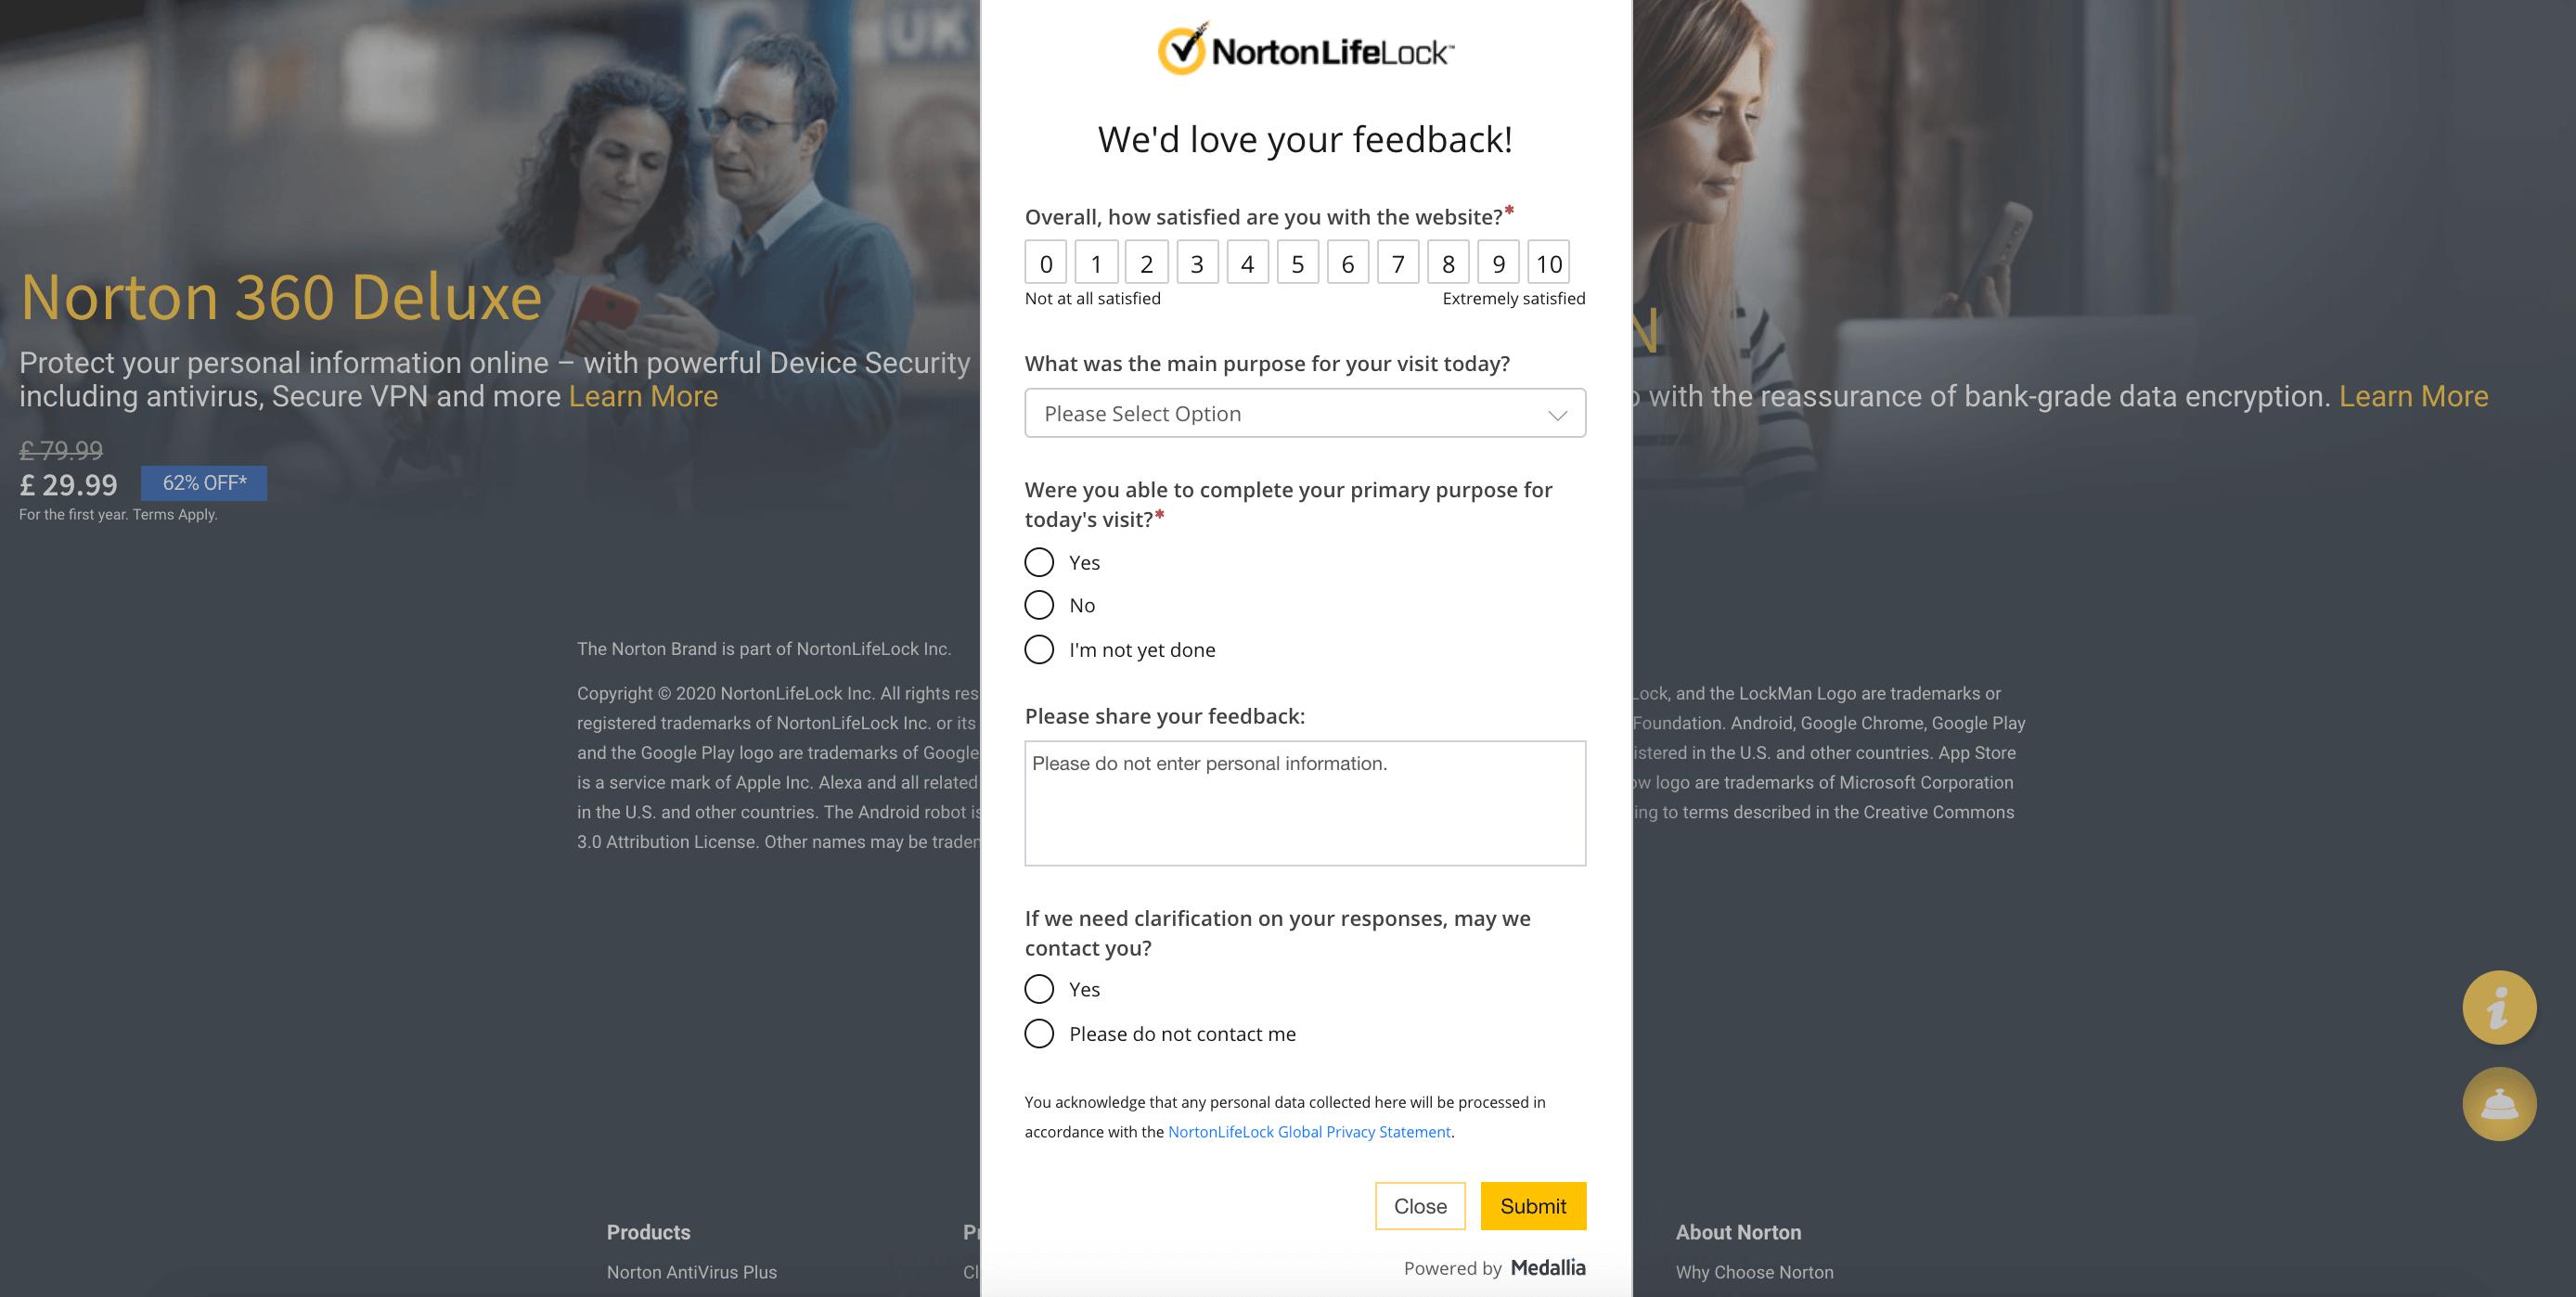 Norton Website Survey Popup